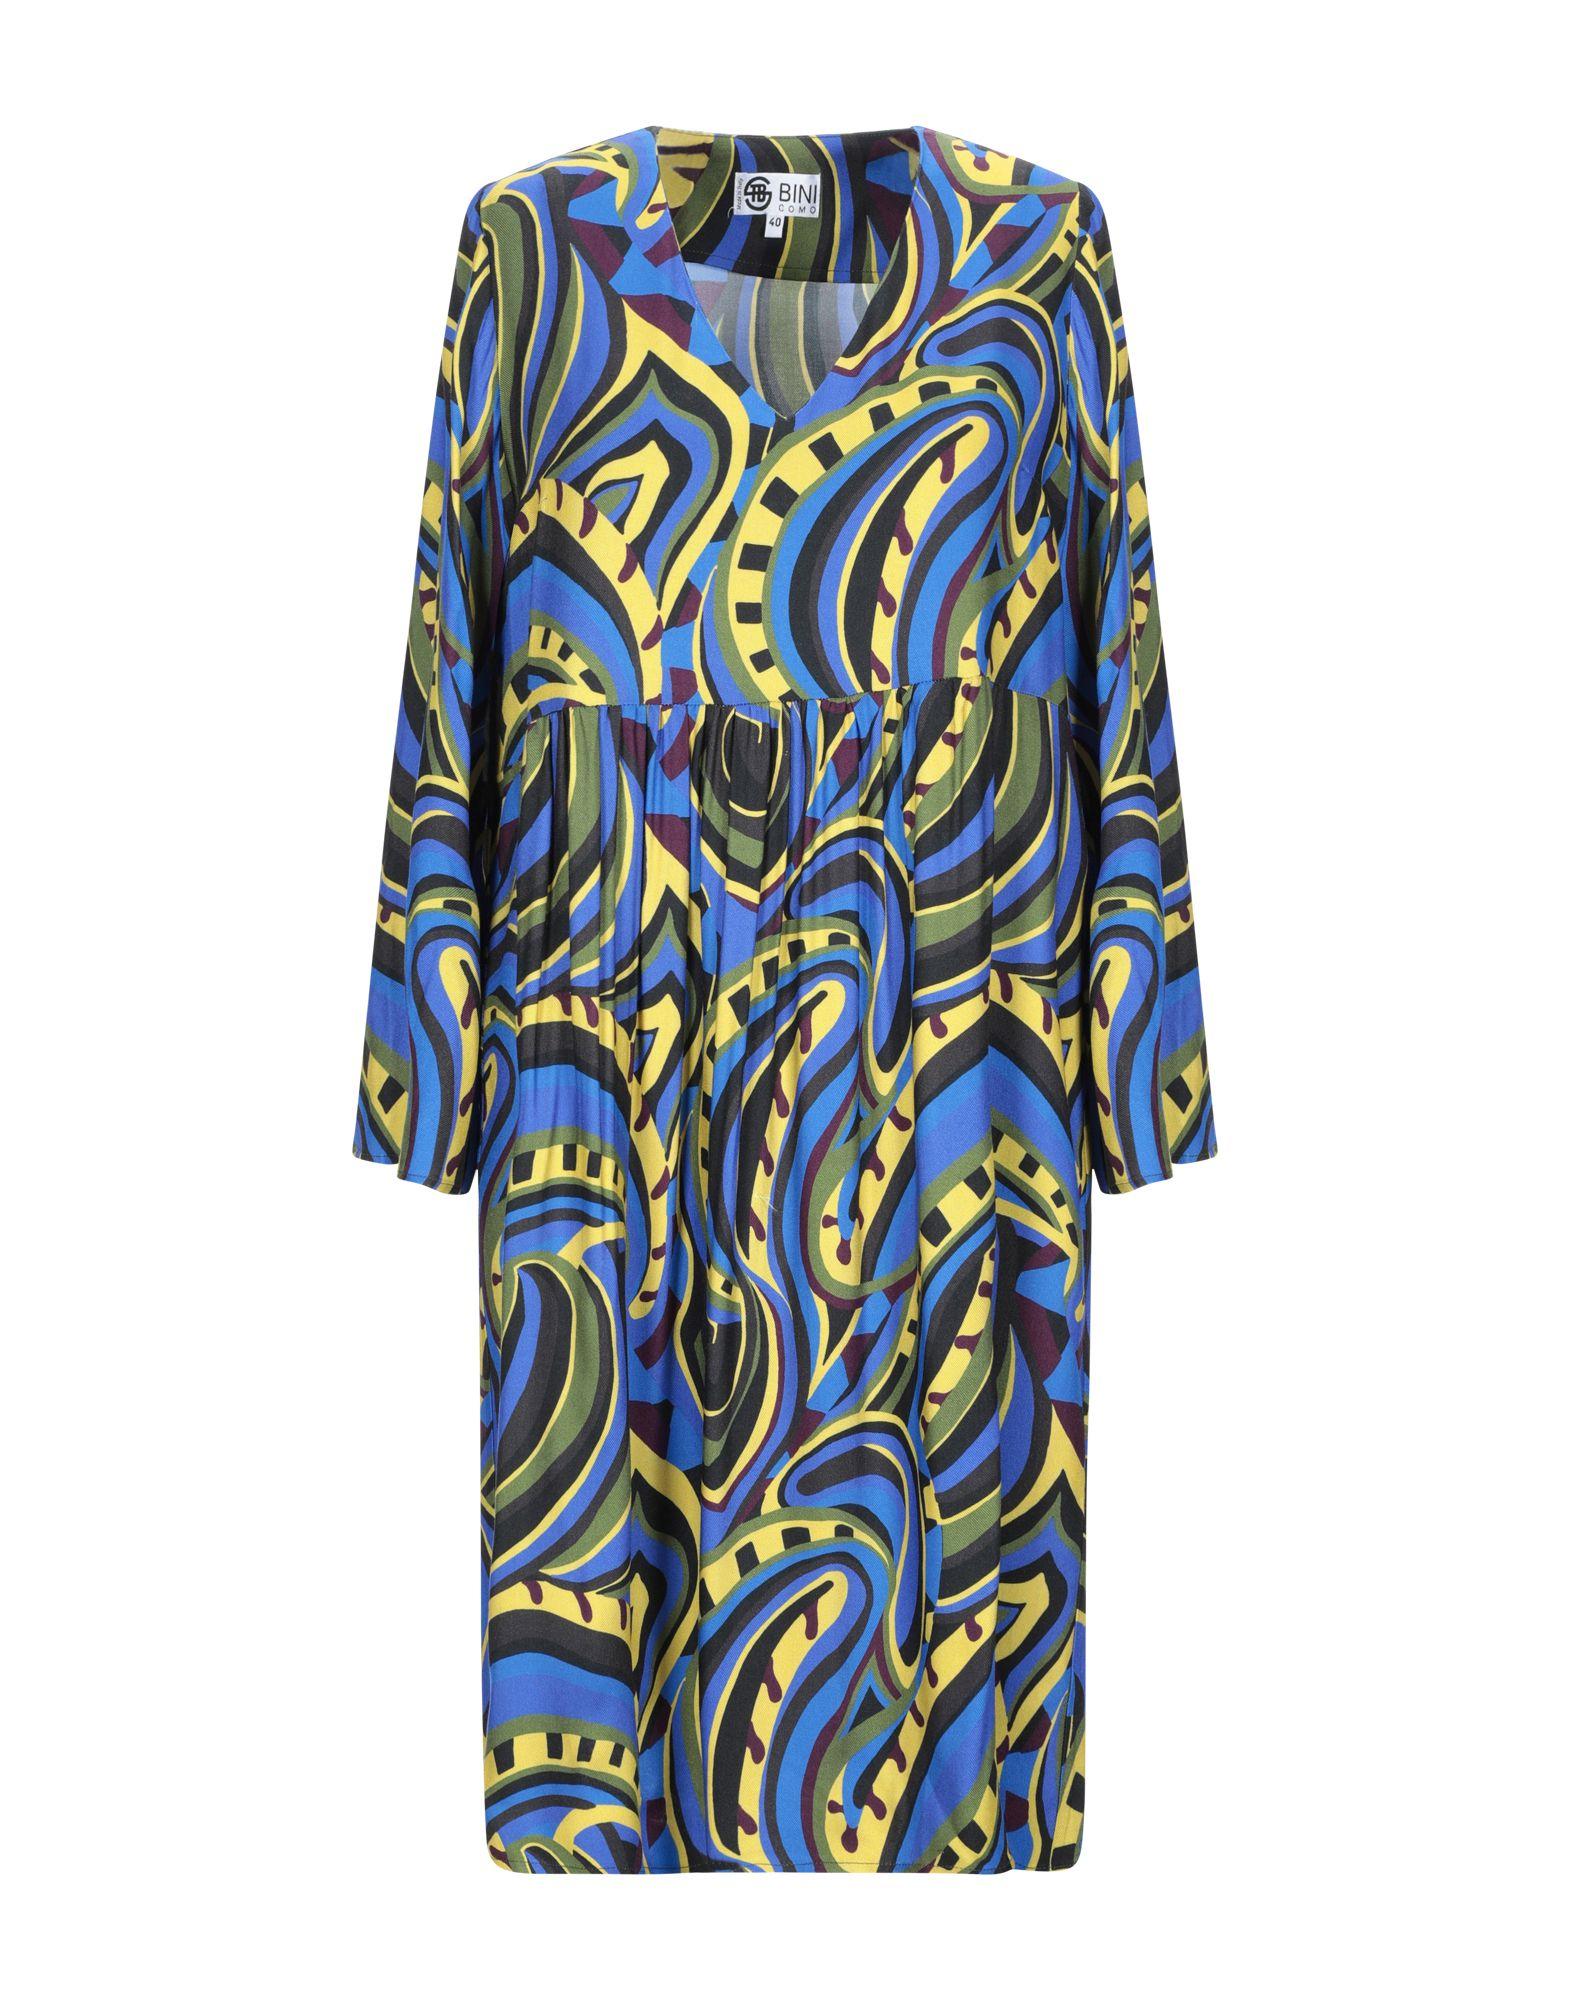 8477f5961b2 bini como mini dresses for women - Buy best women s bini como mini ...